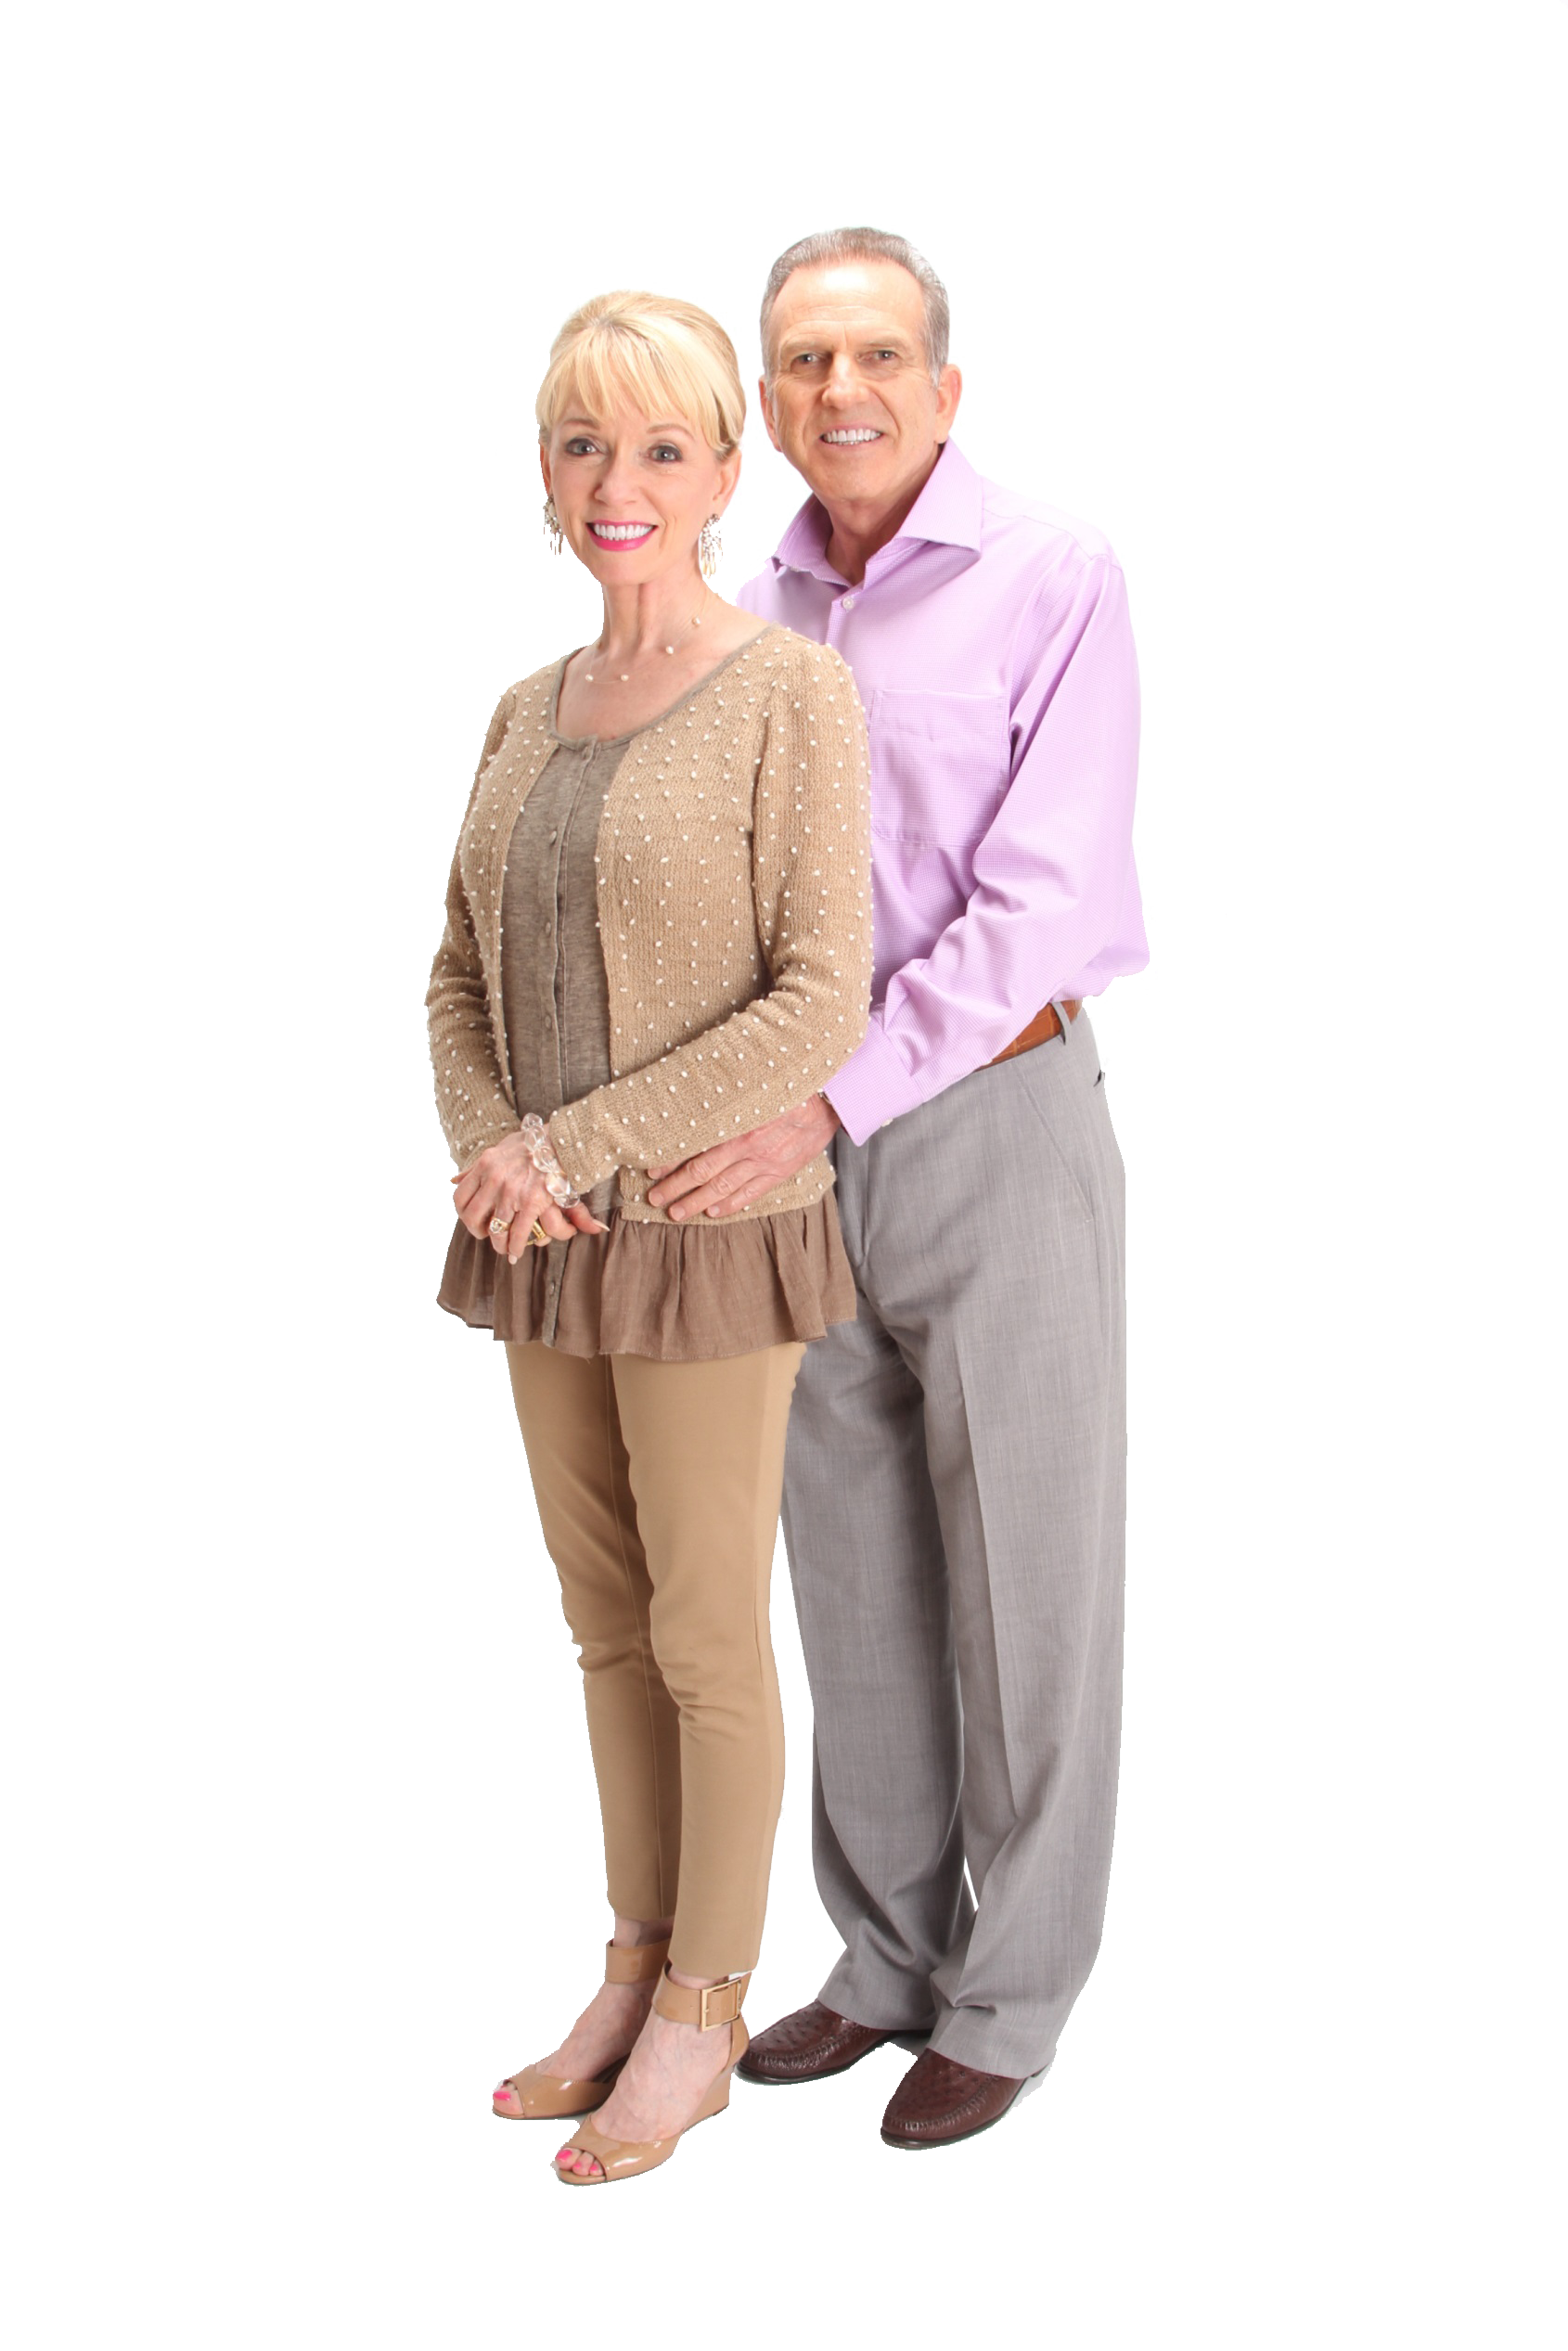 Tom and Mary Barker